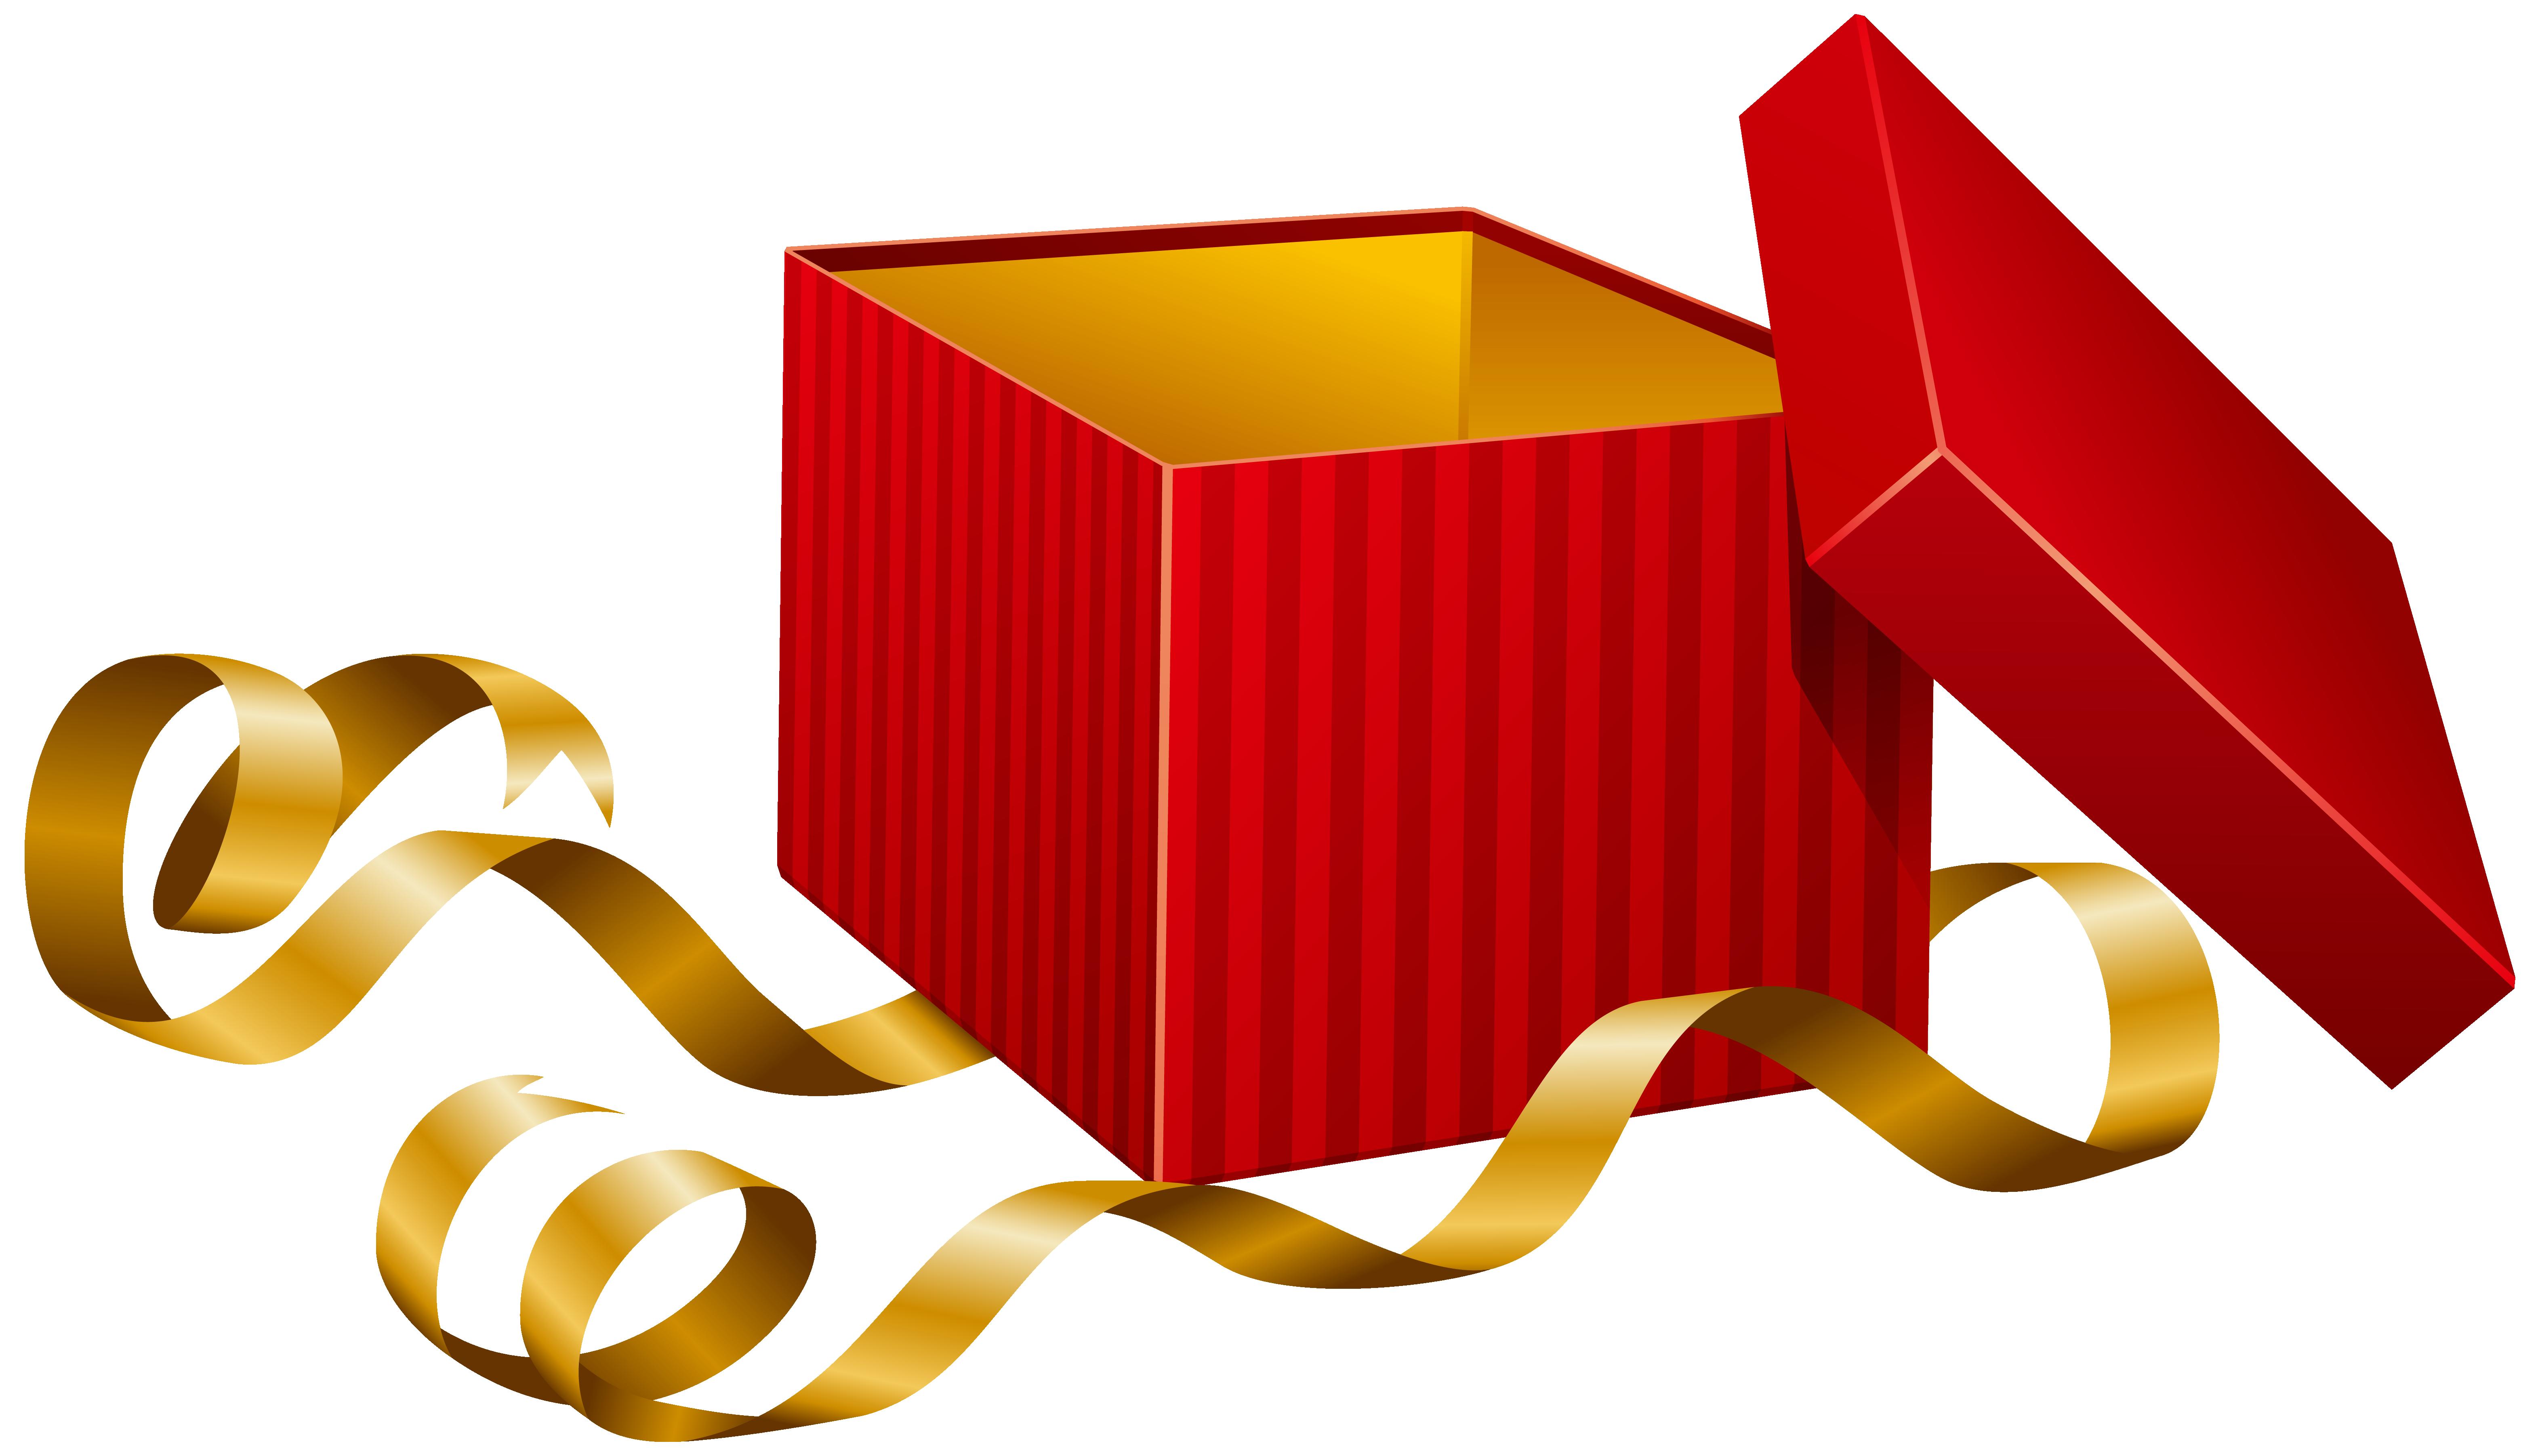 Clipart present illustration. Open gift clip art